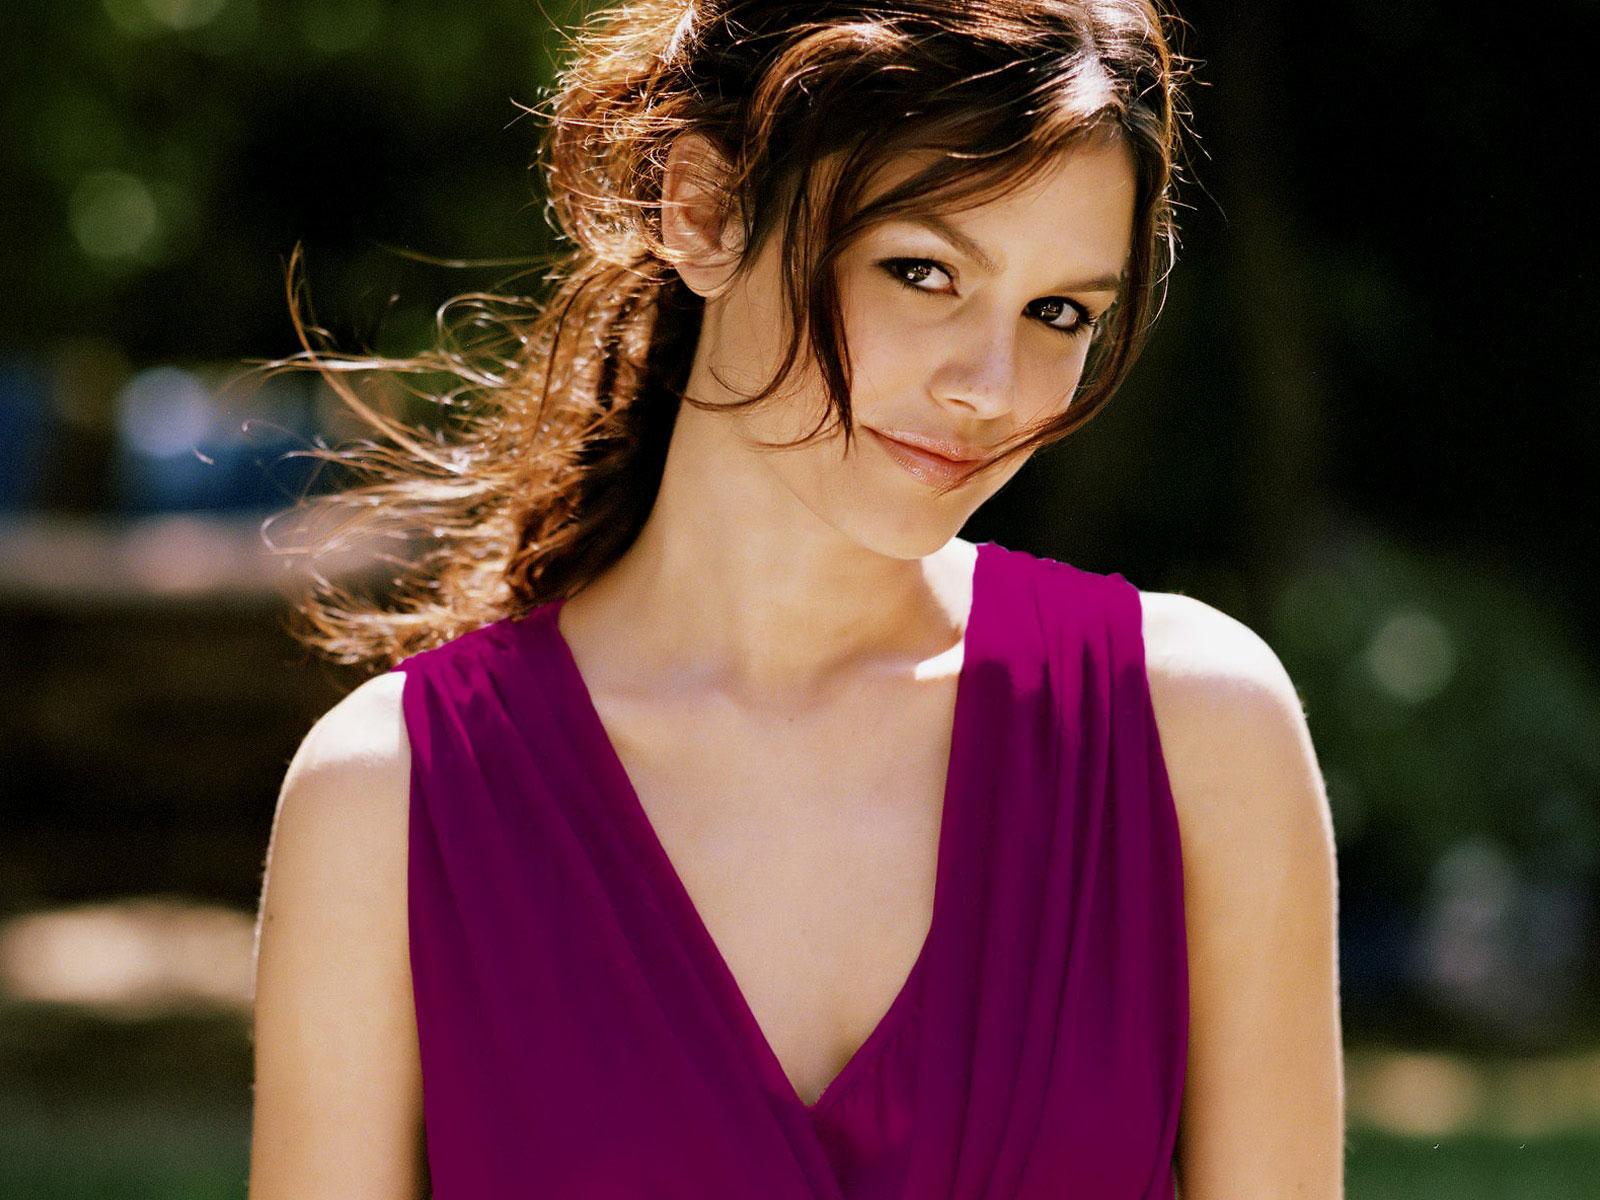 Jumper Actress Rachel Sarah Bilson HD Free Wallpapers - jumper actress rachel sarah bilson wallpapers